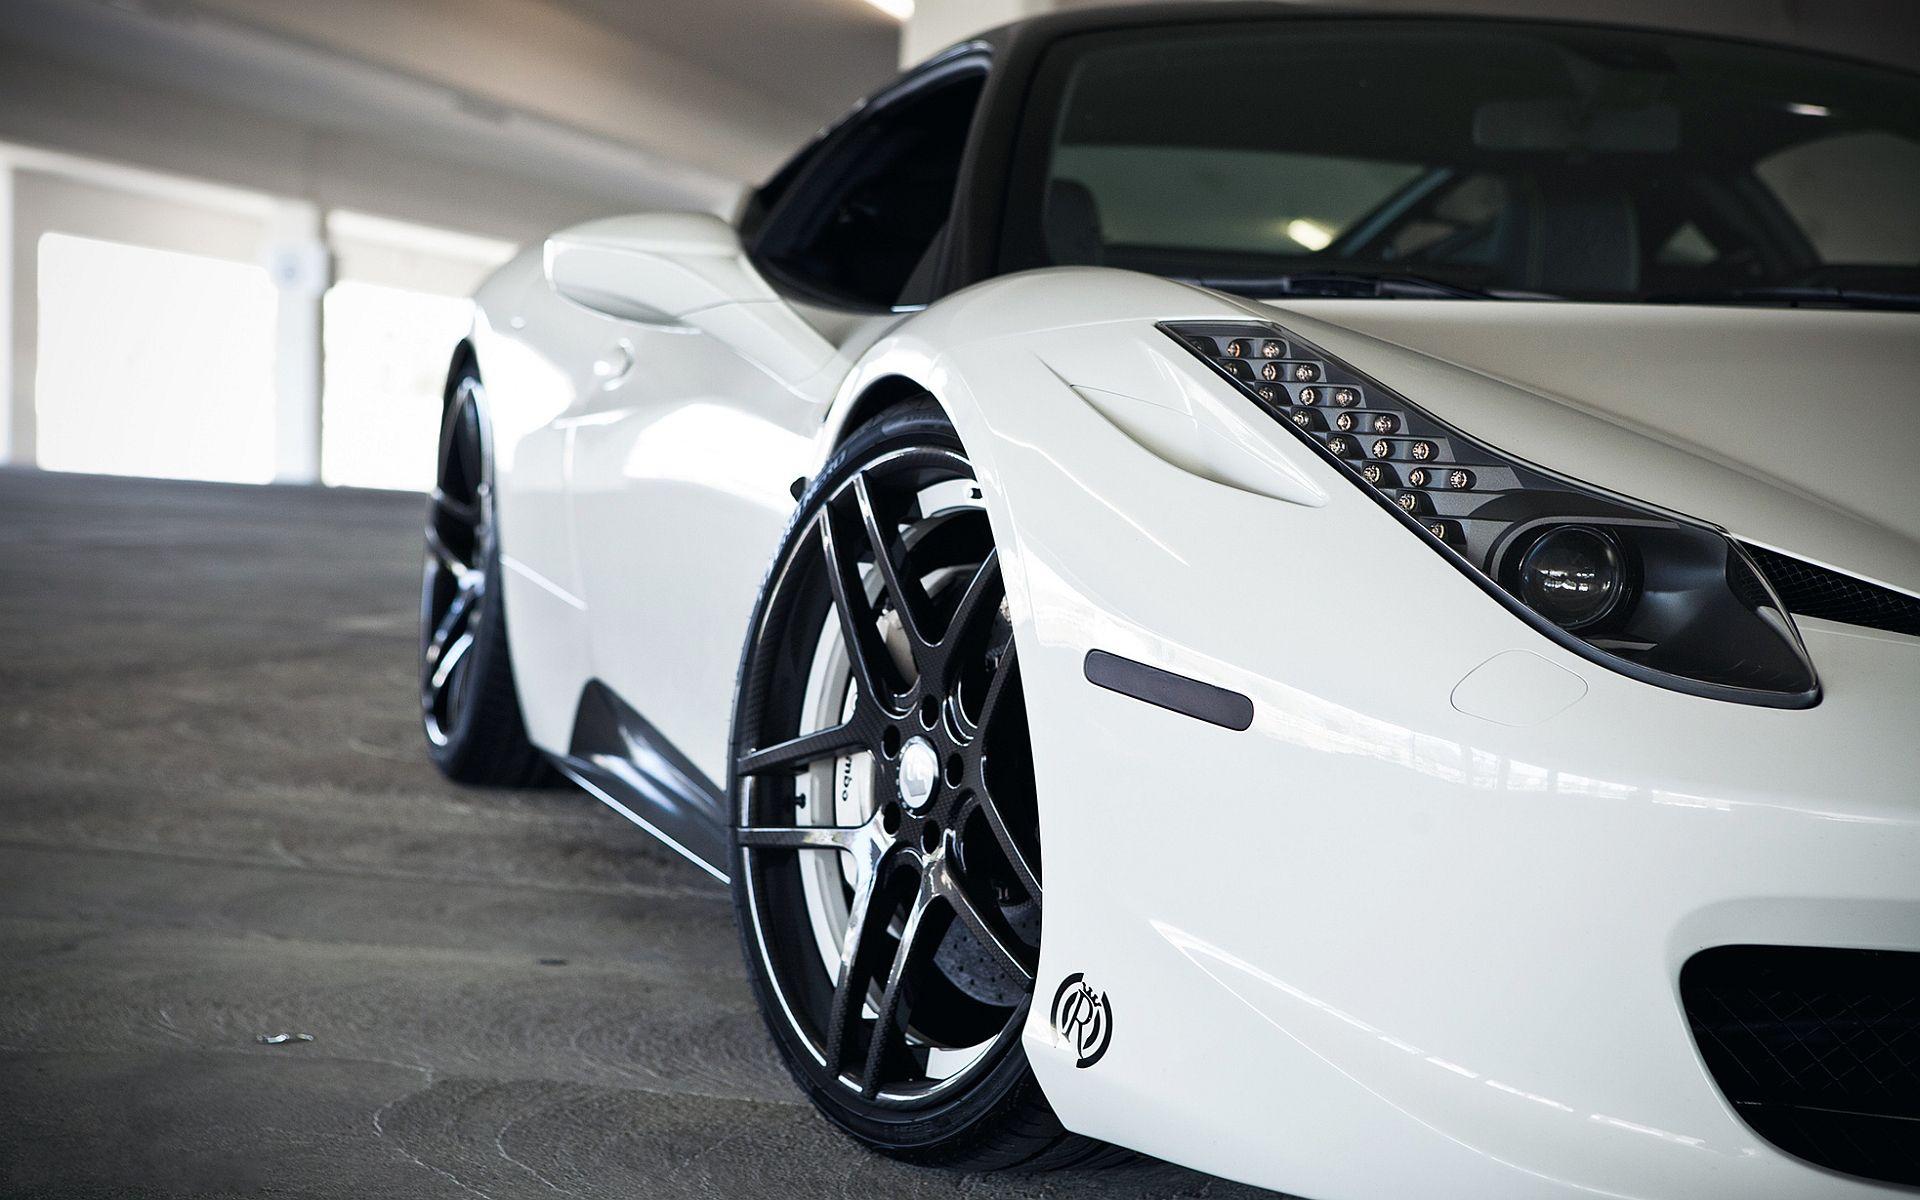 Ferrari 458 italia white desktop wallpaper ferrari wallpapers ferrari 458 italia white desktop wallpaper vanachro Image collections